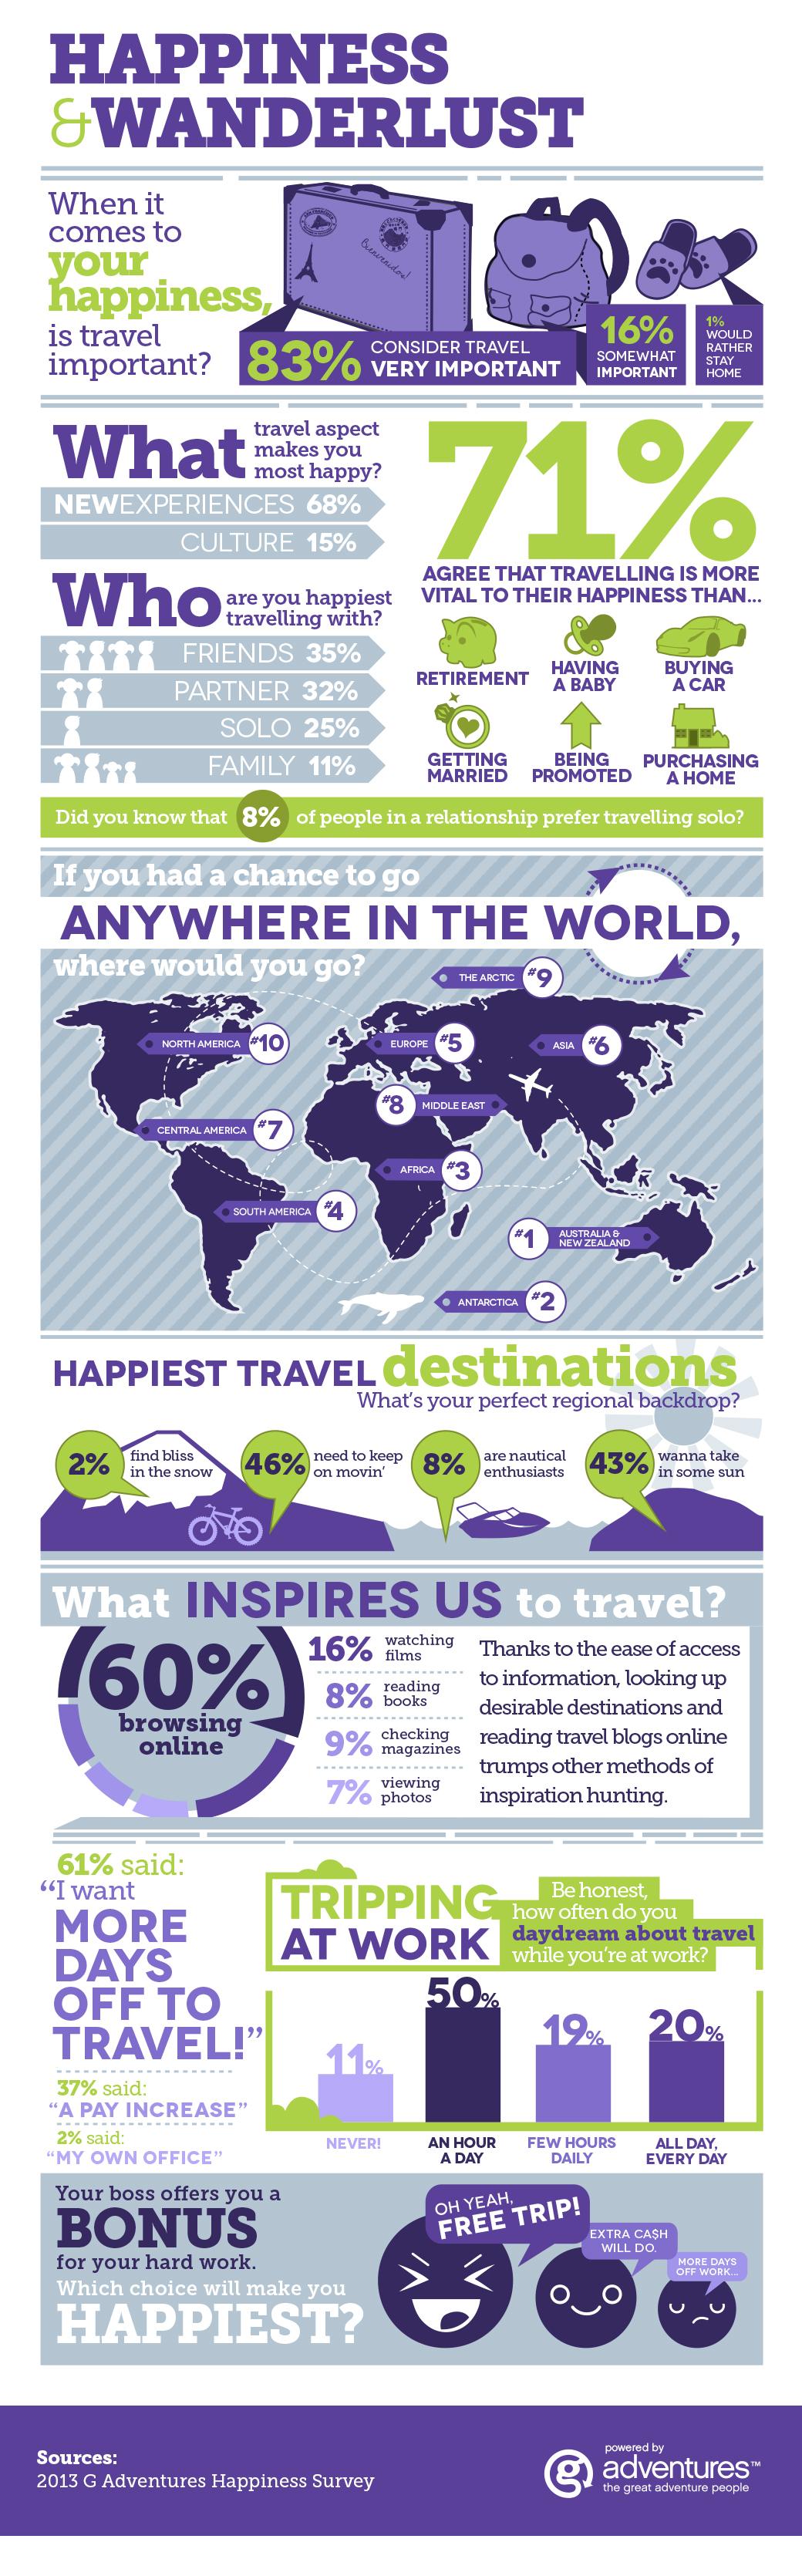 G Adventures Happiness Survey Infographic